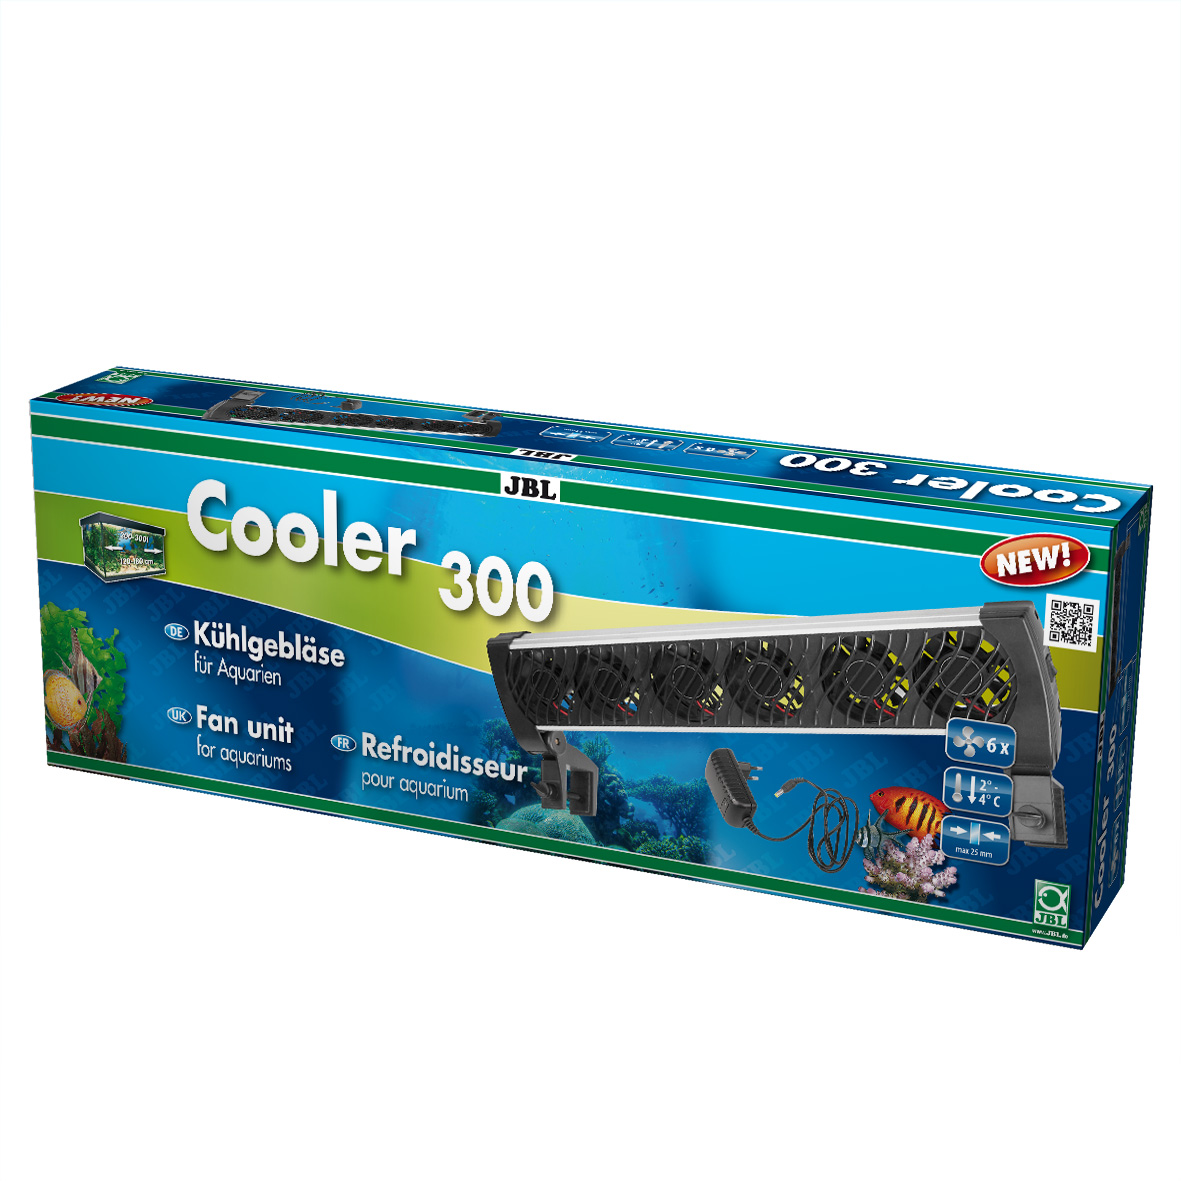 JBL Cooler 300 6044200